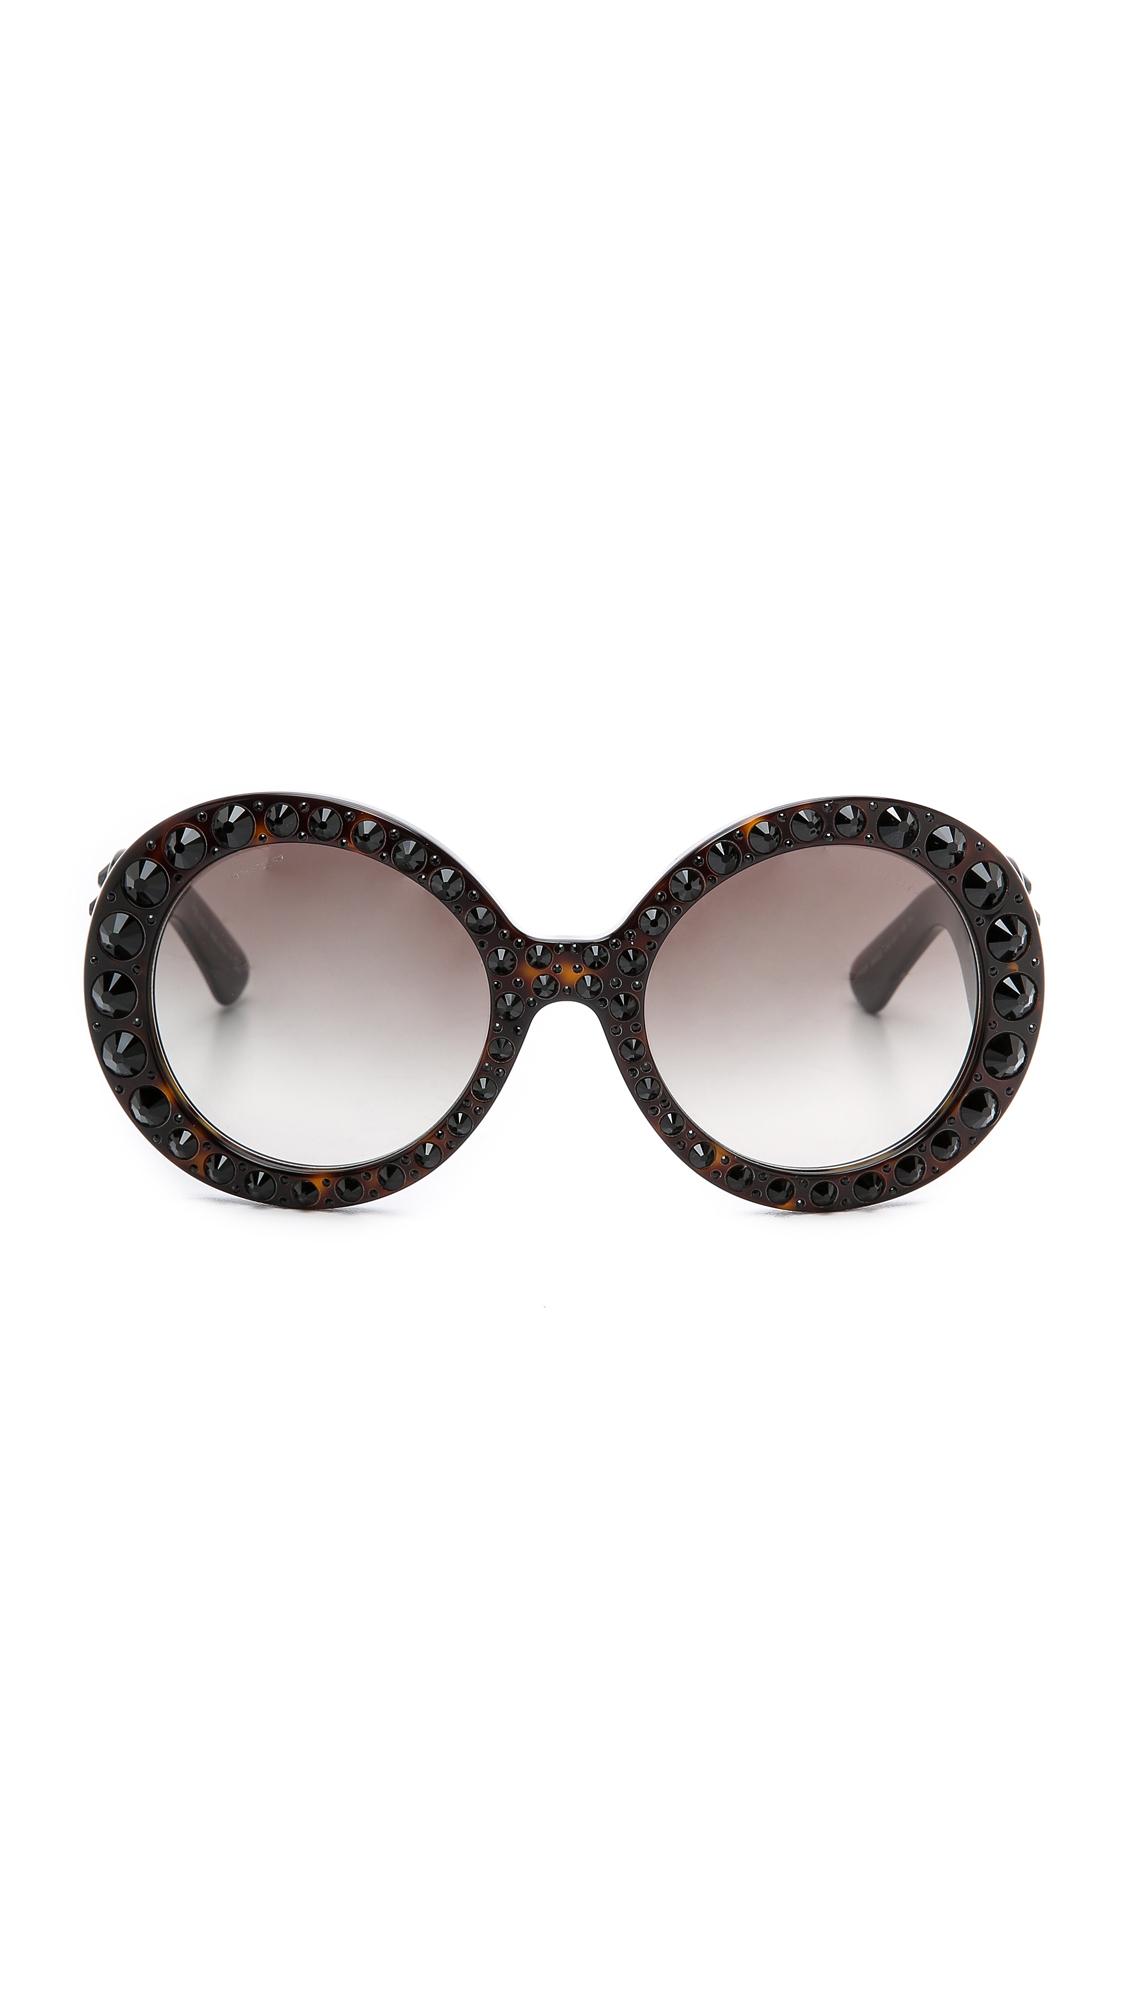 463baee8530 ... where to buy lyst prada studded round sunglasses havana grey gradient  in gray fd8f5 cccbe